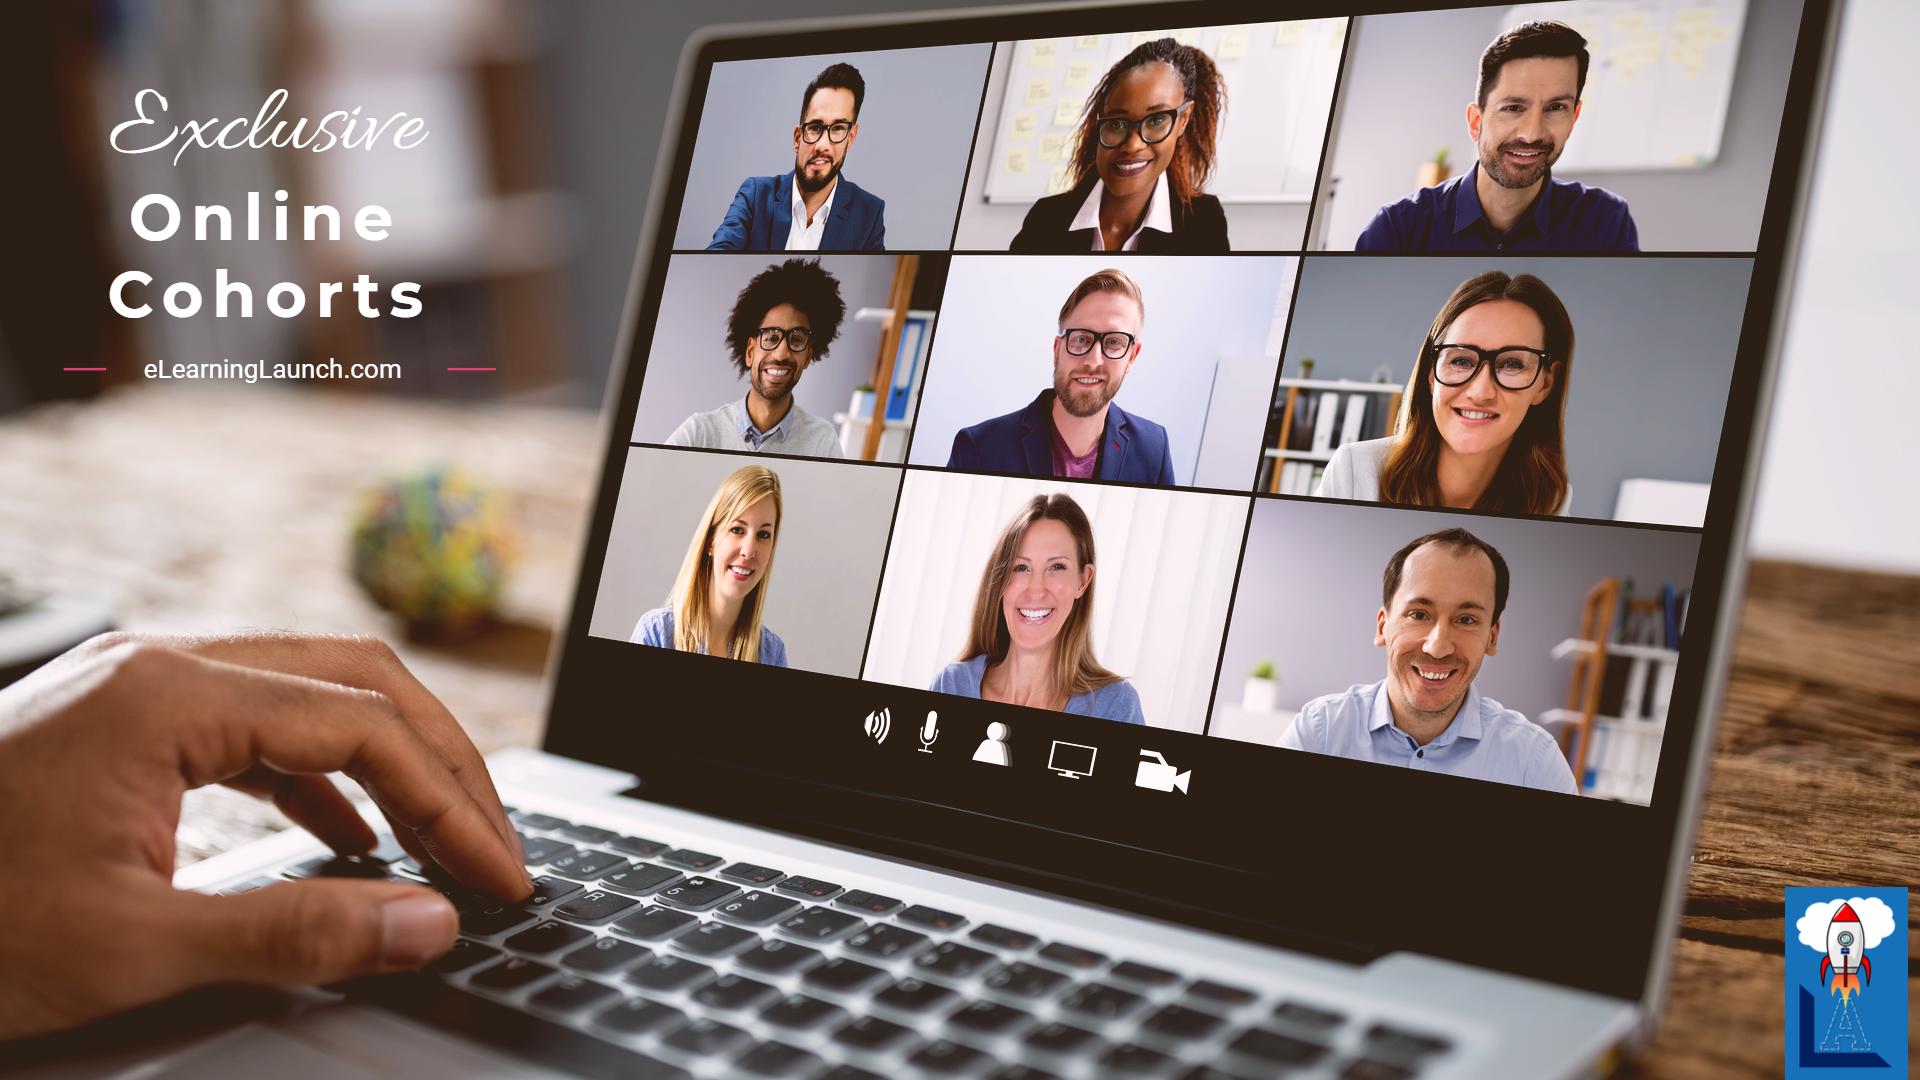 image of several people in online meeting